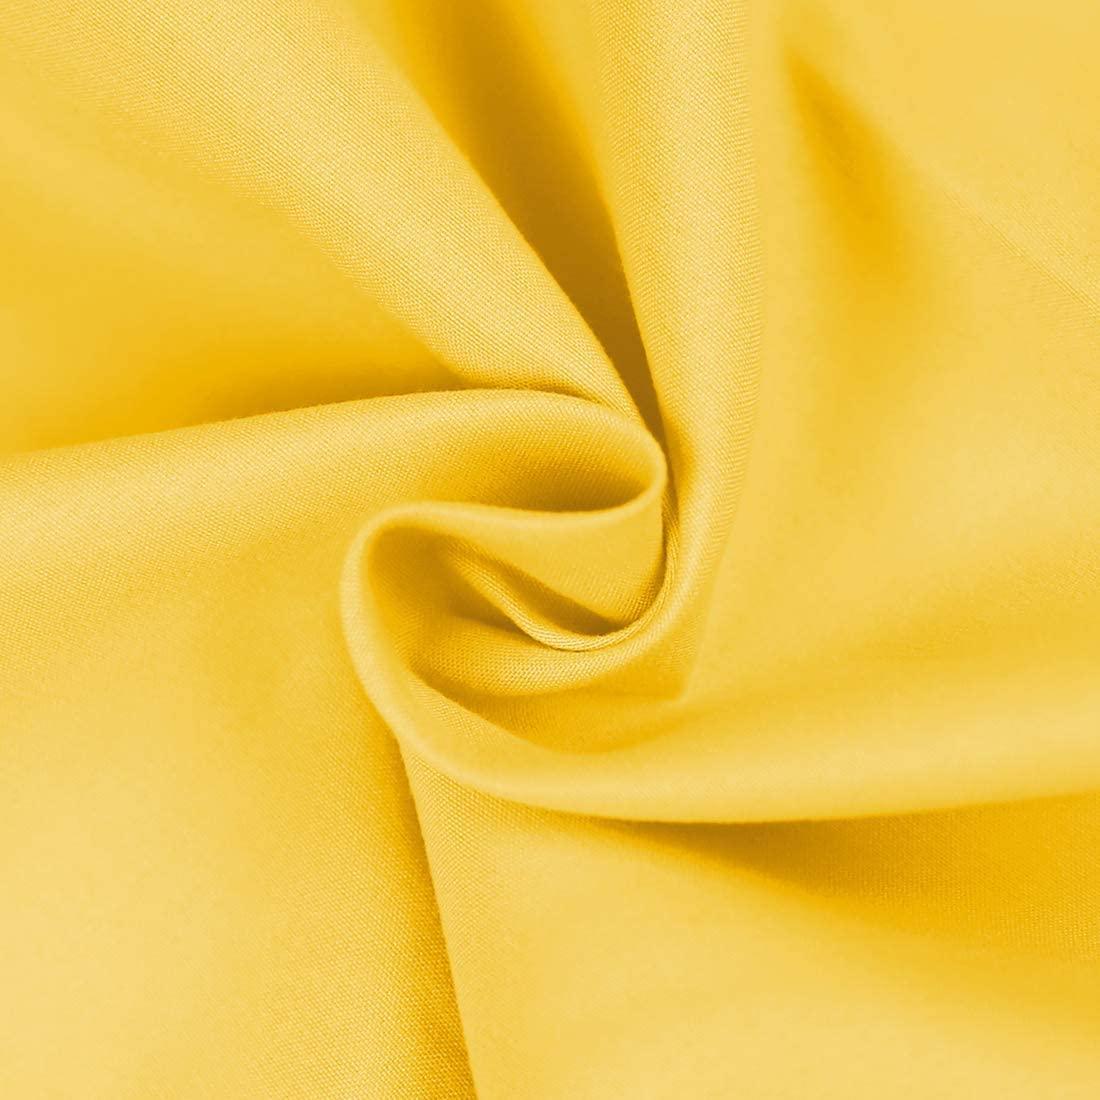 ABP Collection Bed Sheet Set - Super Soft Silky Satin Bedding Sheet Set 21